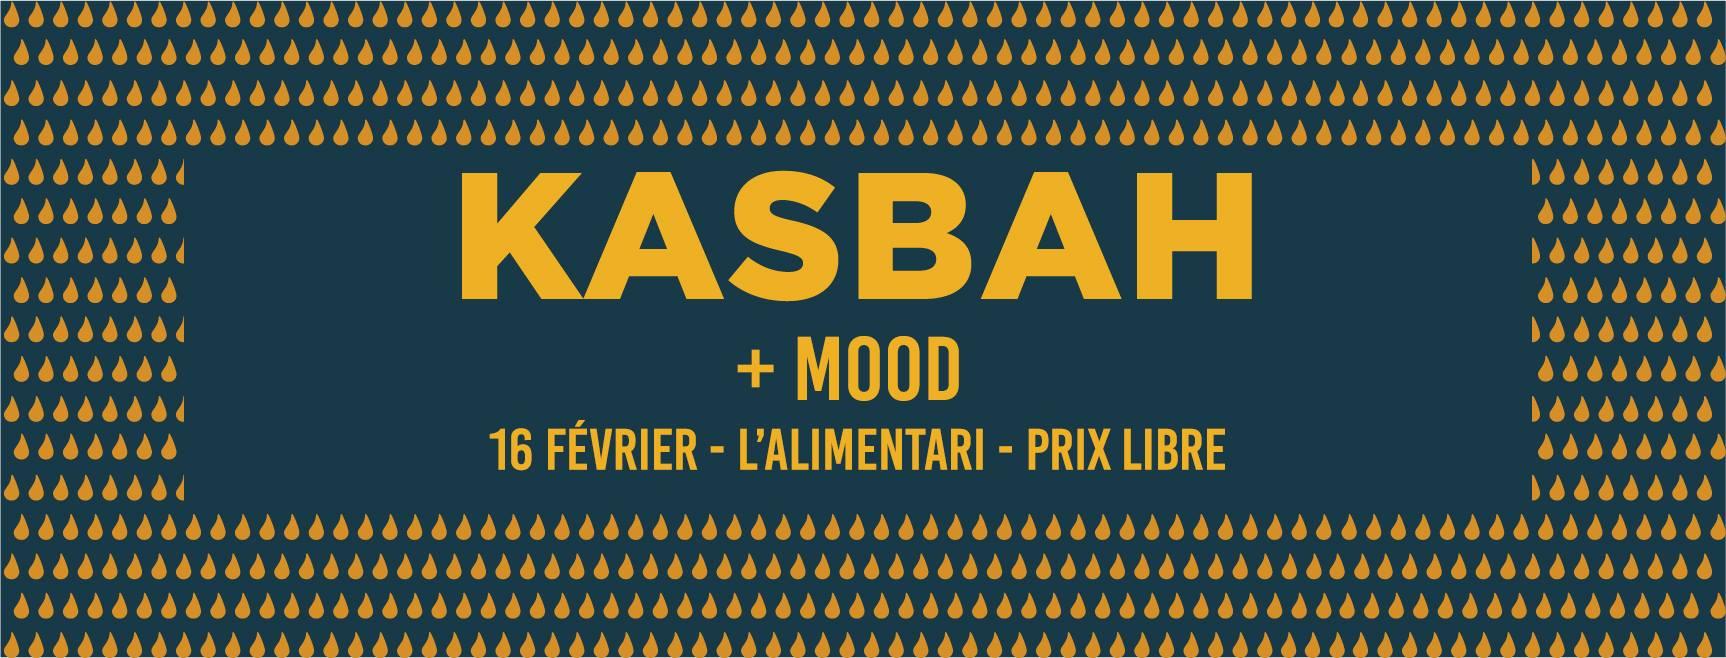 KasbaH (live) // Mood